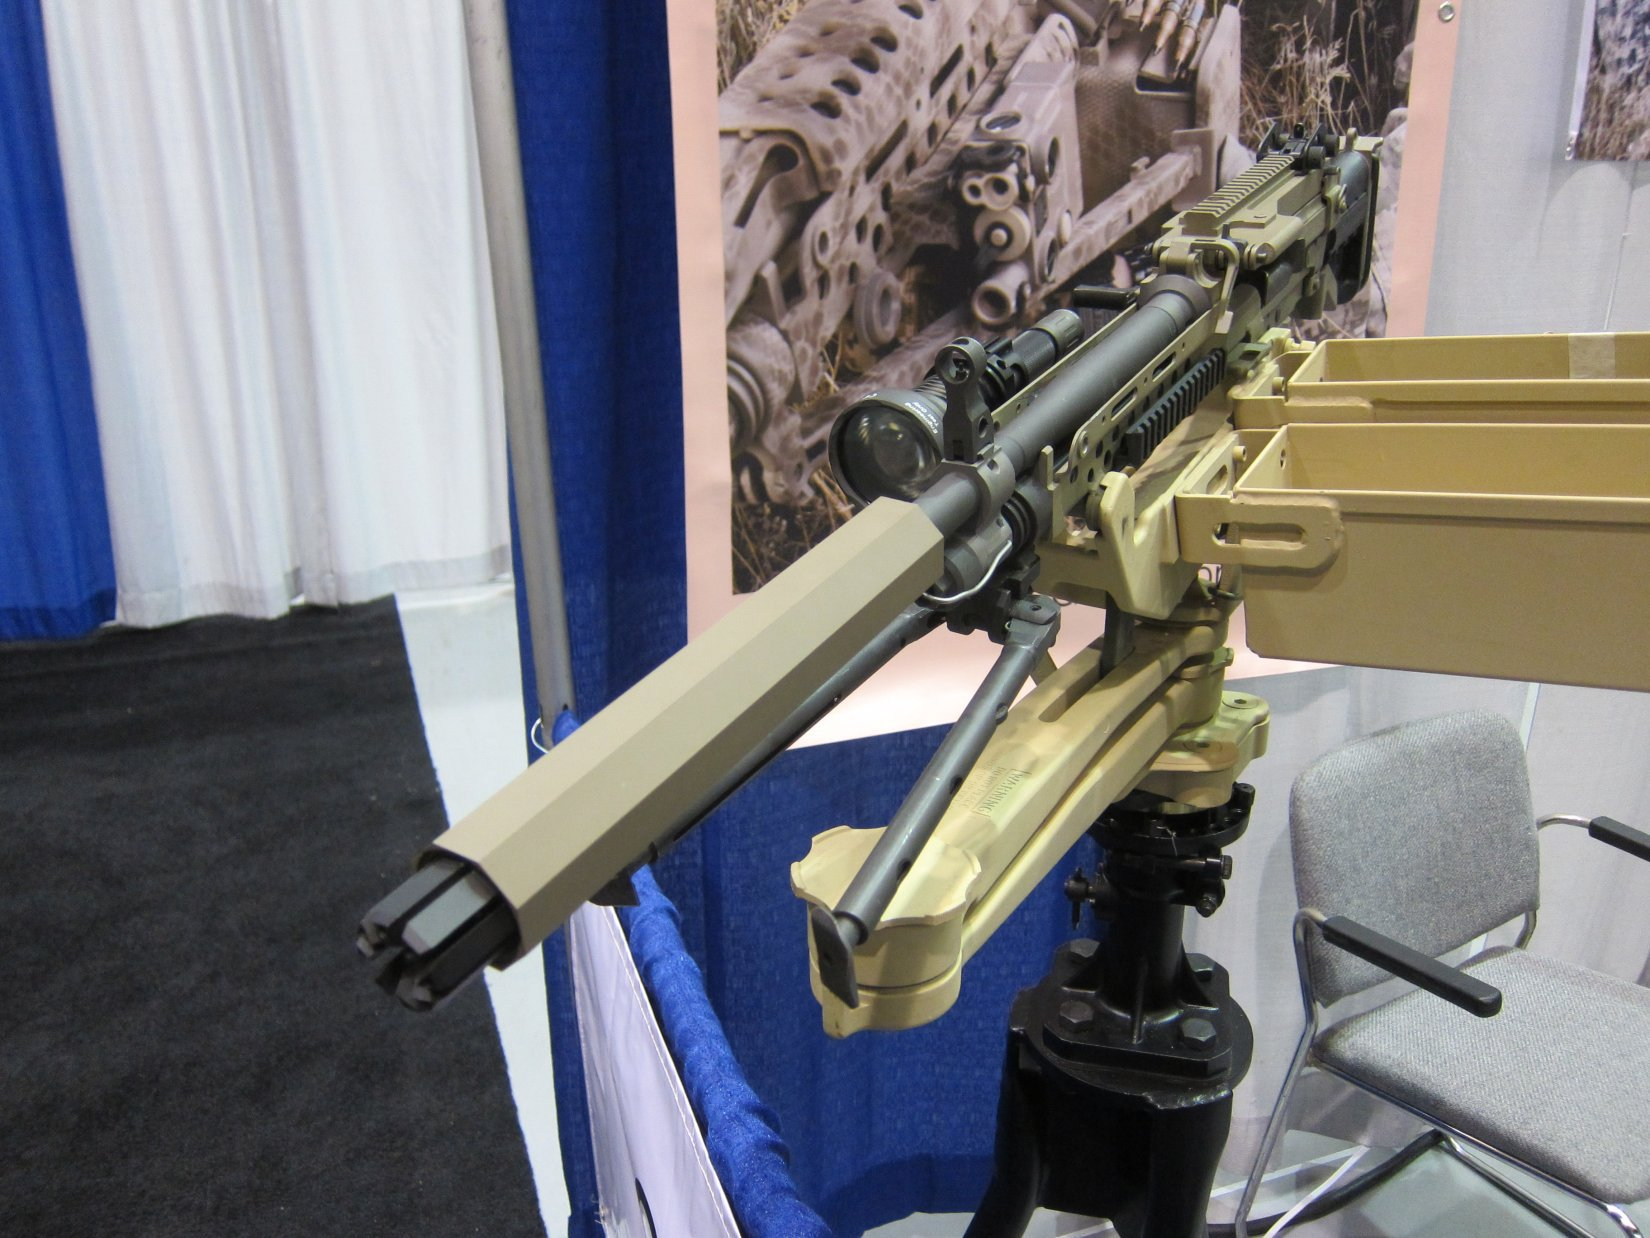 Bravo 18 Zero-Back-Pressure MG Suppressor (ZBPMGS): Full-Auto-Rated Octagonal Machine Gun Silencer/Sound Suppressors for Assault Rifles and Machine Guns: More Accuracy, Less Stress–and No Mirage!